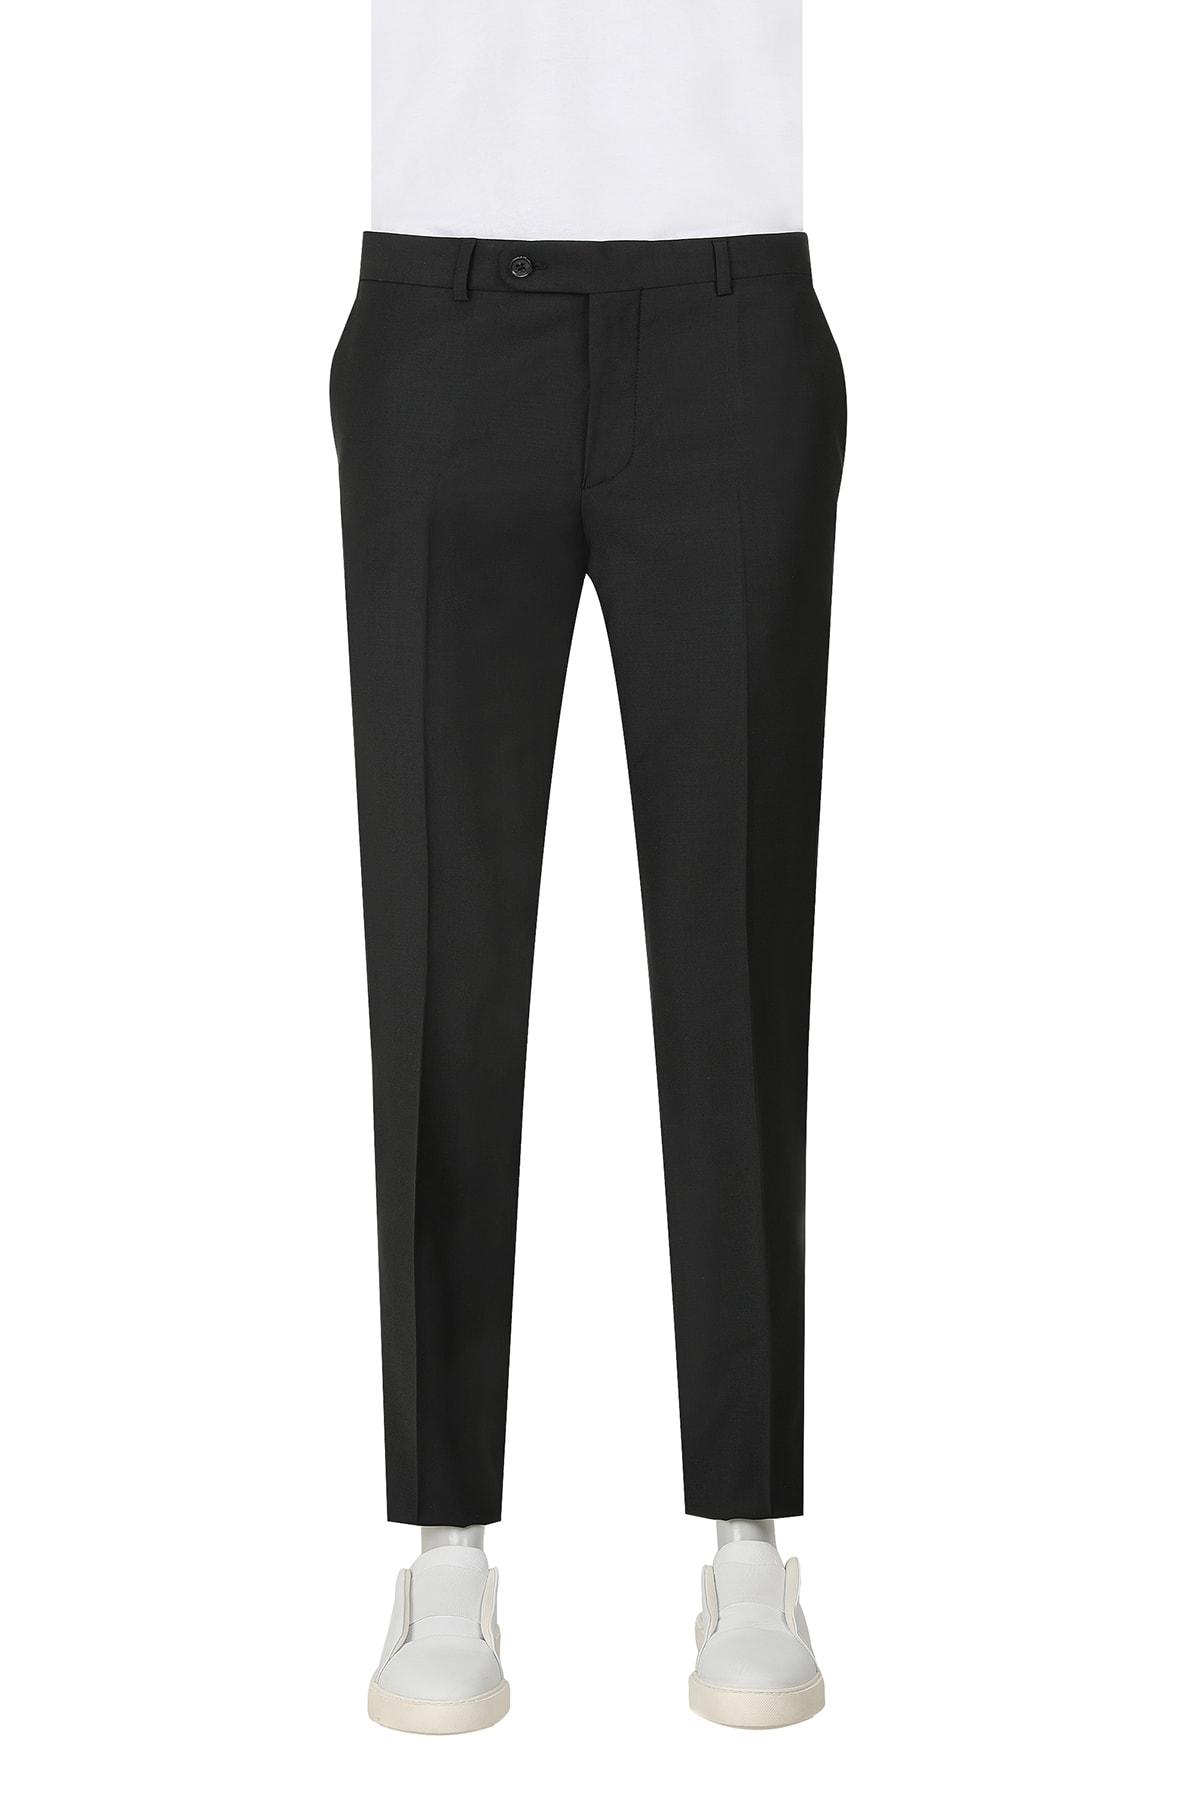 D'S Damat Siyah Renk Erkek  Pantolon (Slim Fit) 1